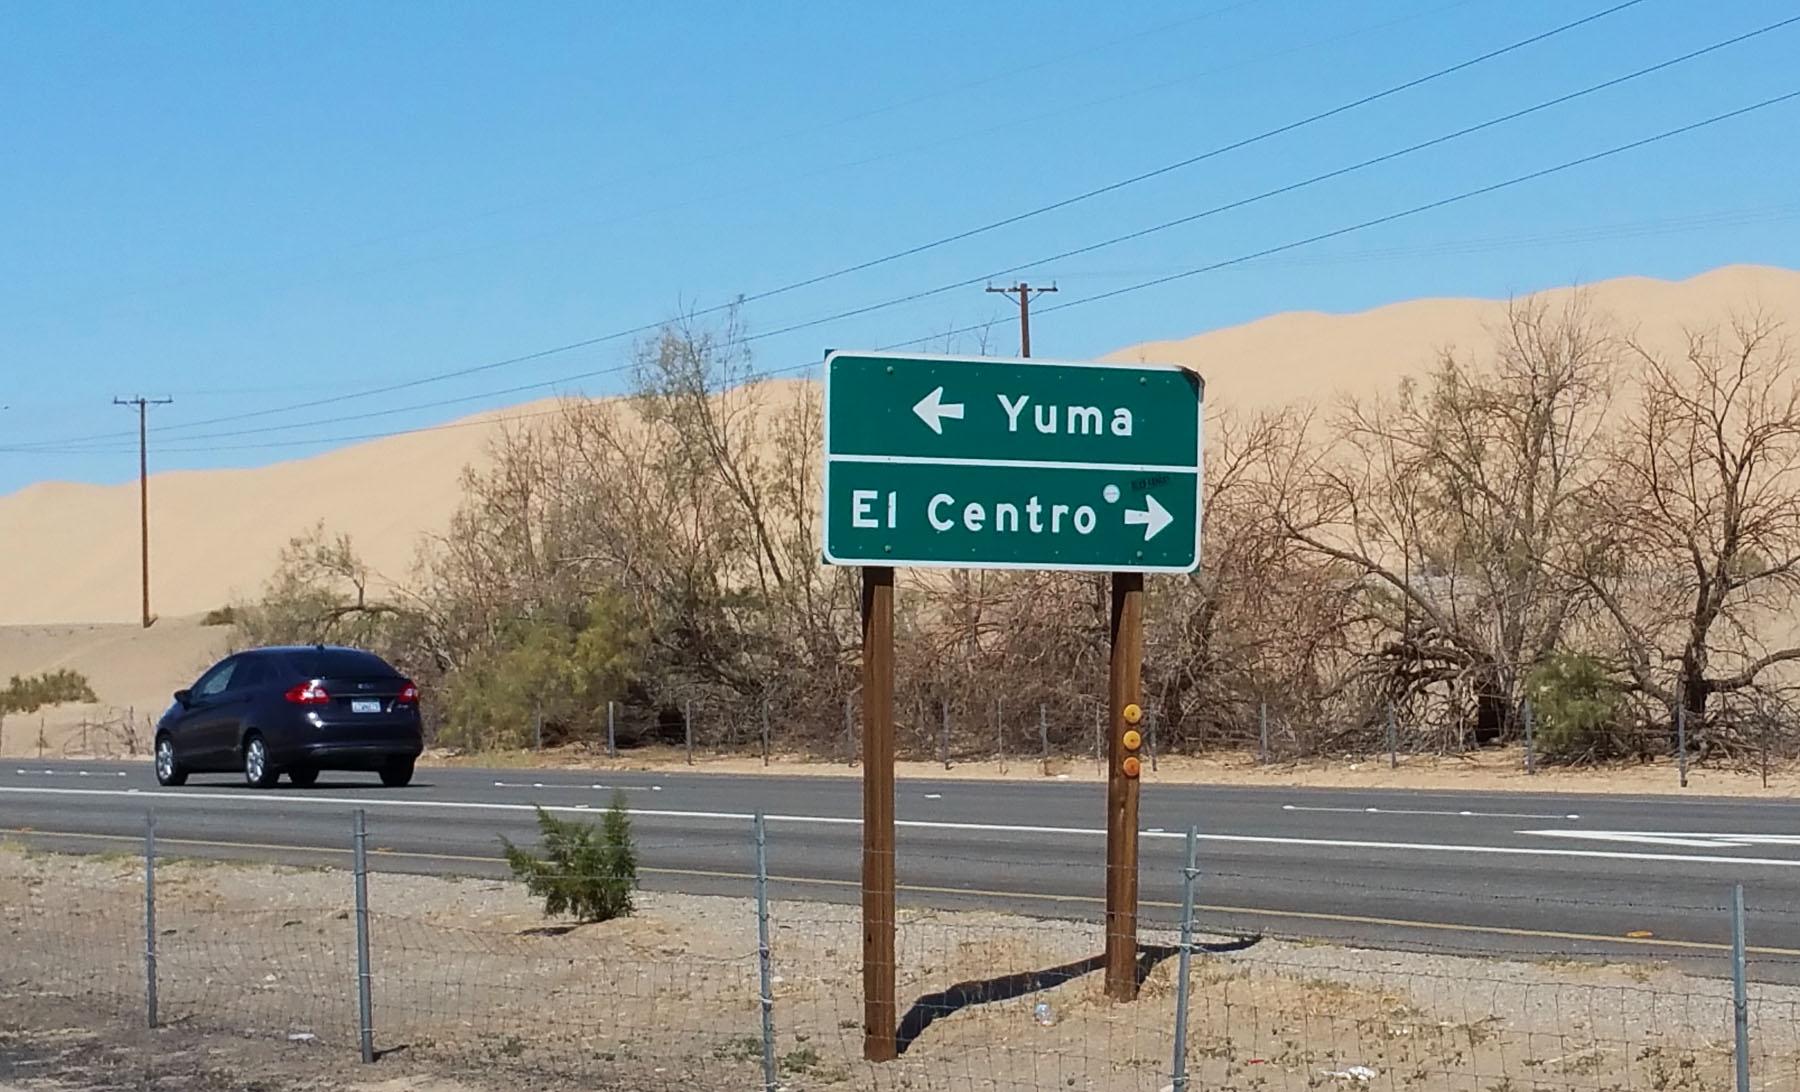 yuma-el-centro-sign-dunes